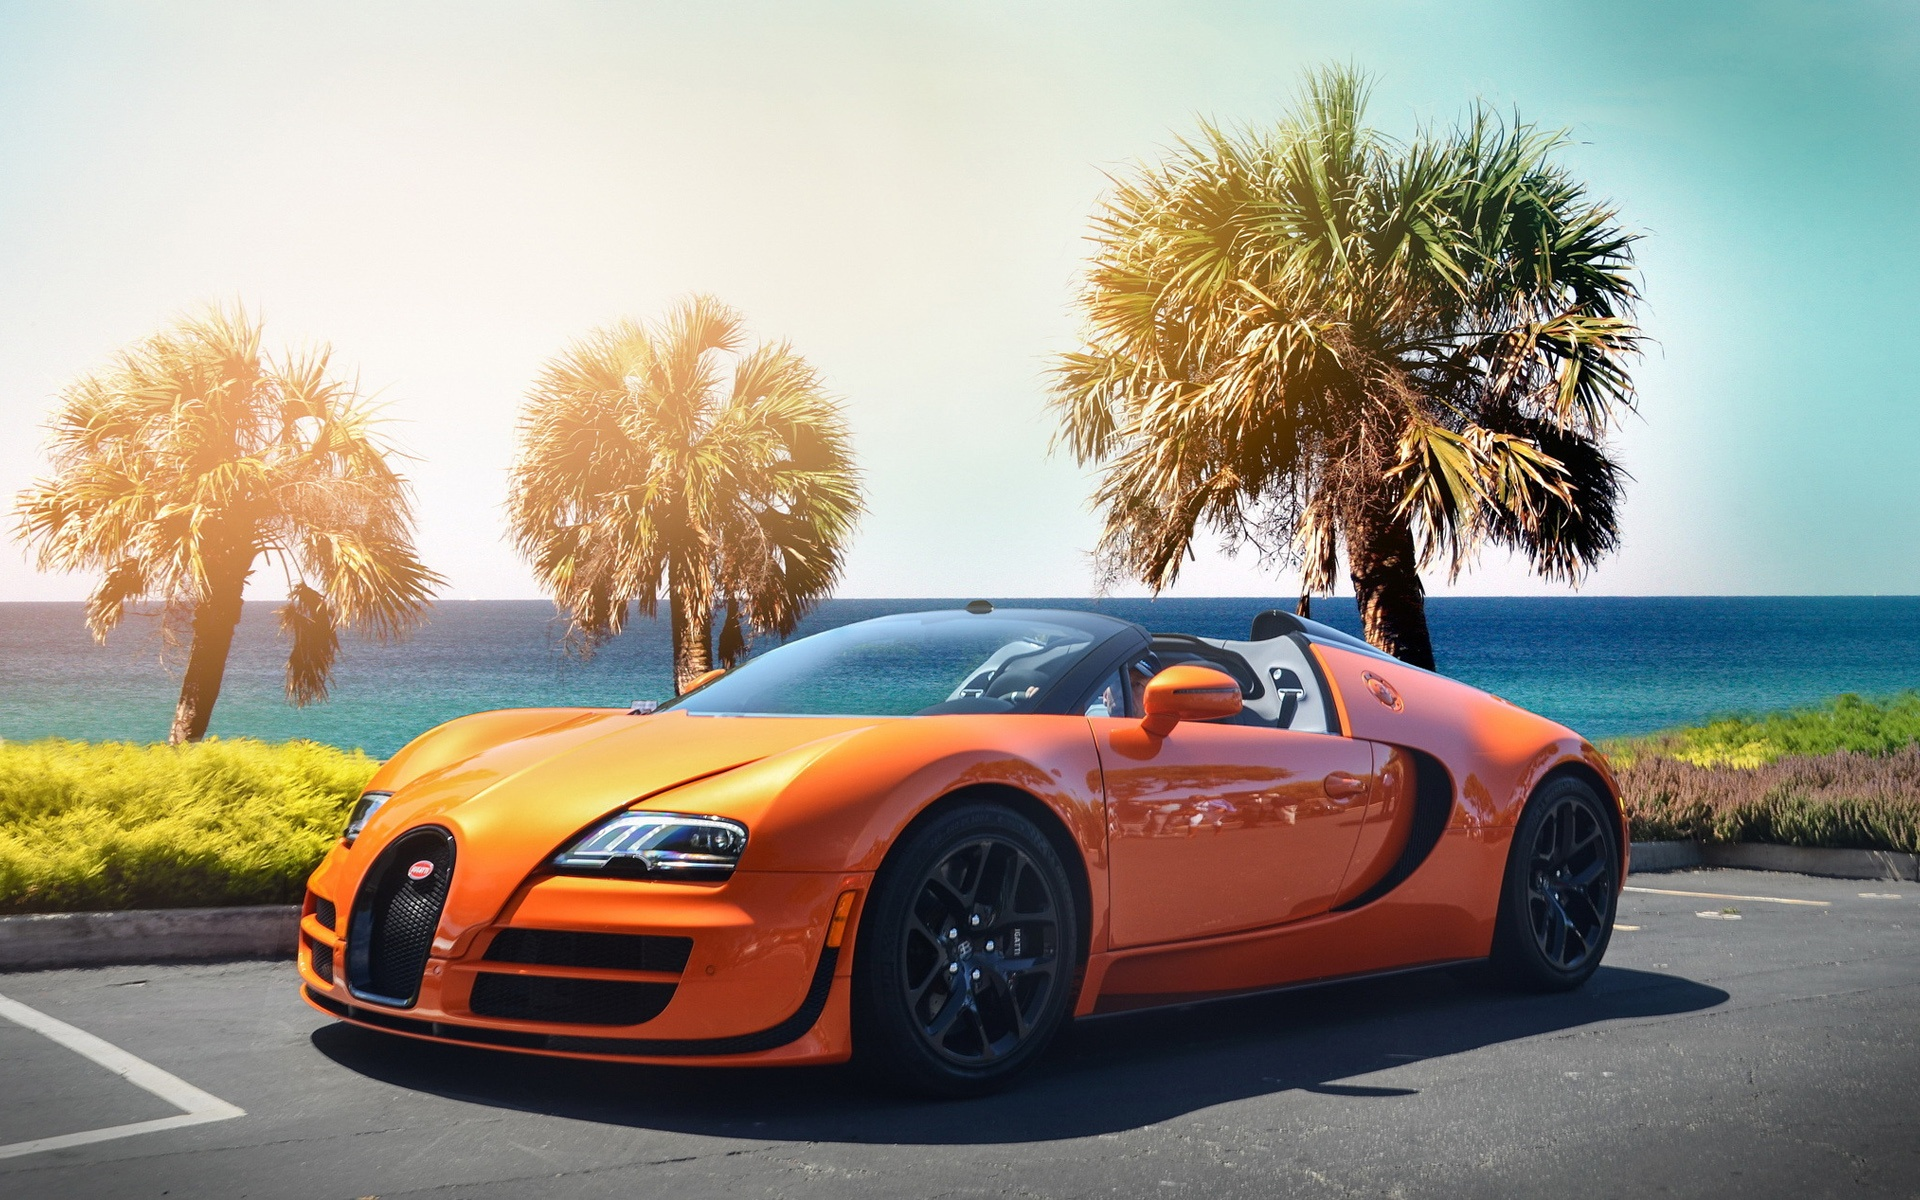 bugatti veyron hypercar orange wallpaper hd - Bugatti Veyron Wallpaper